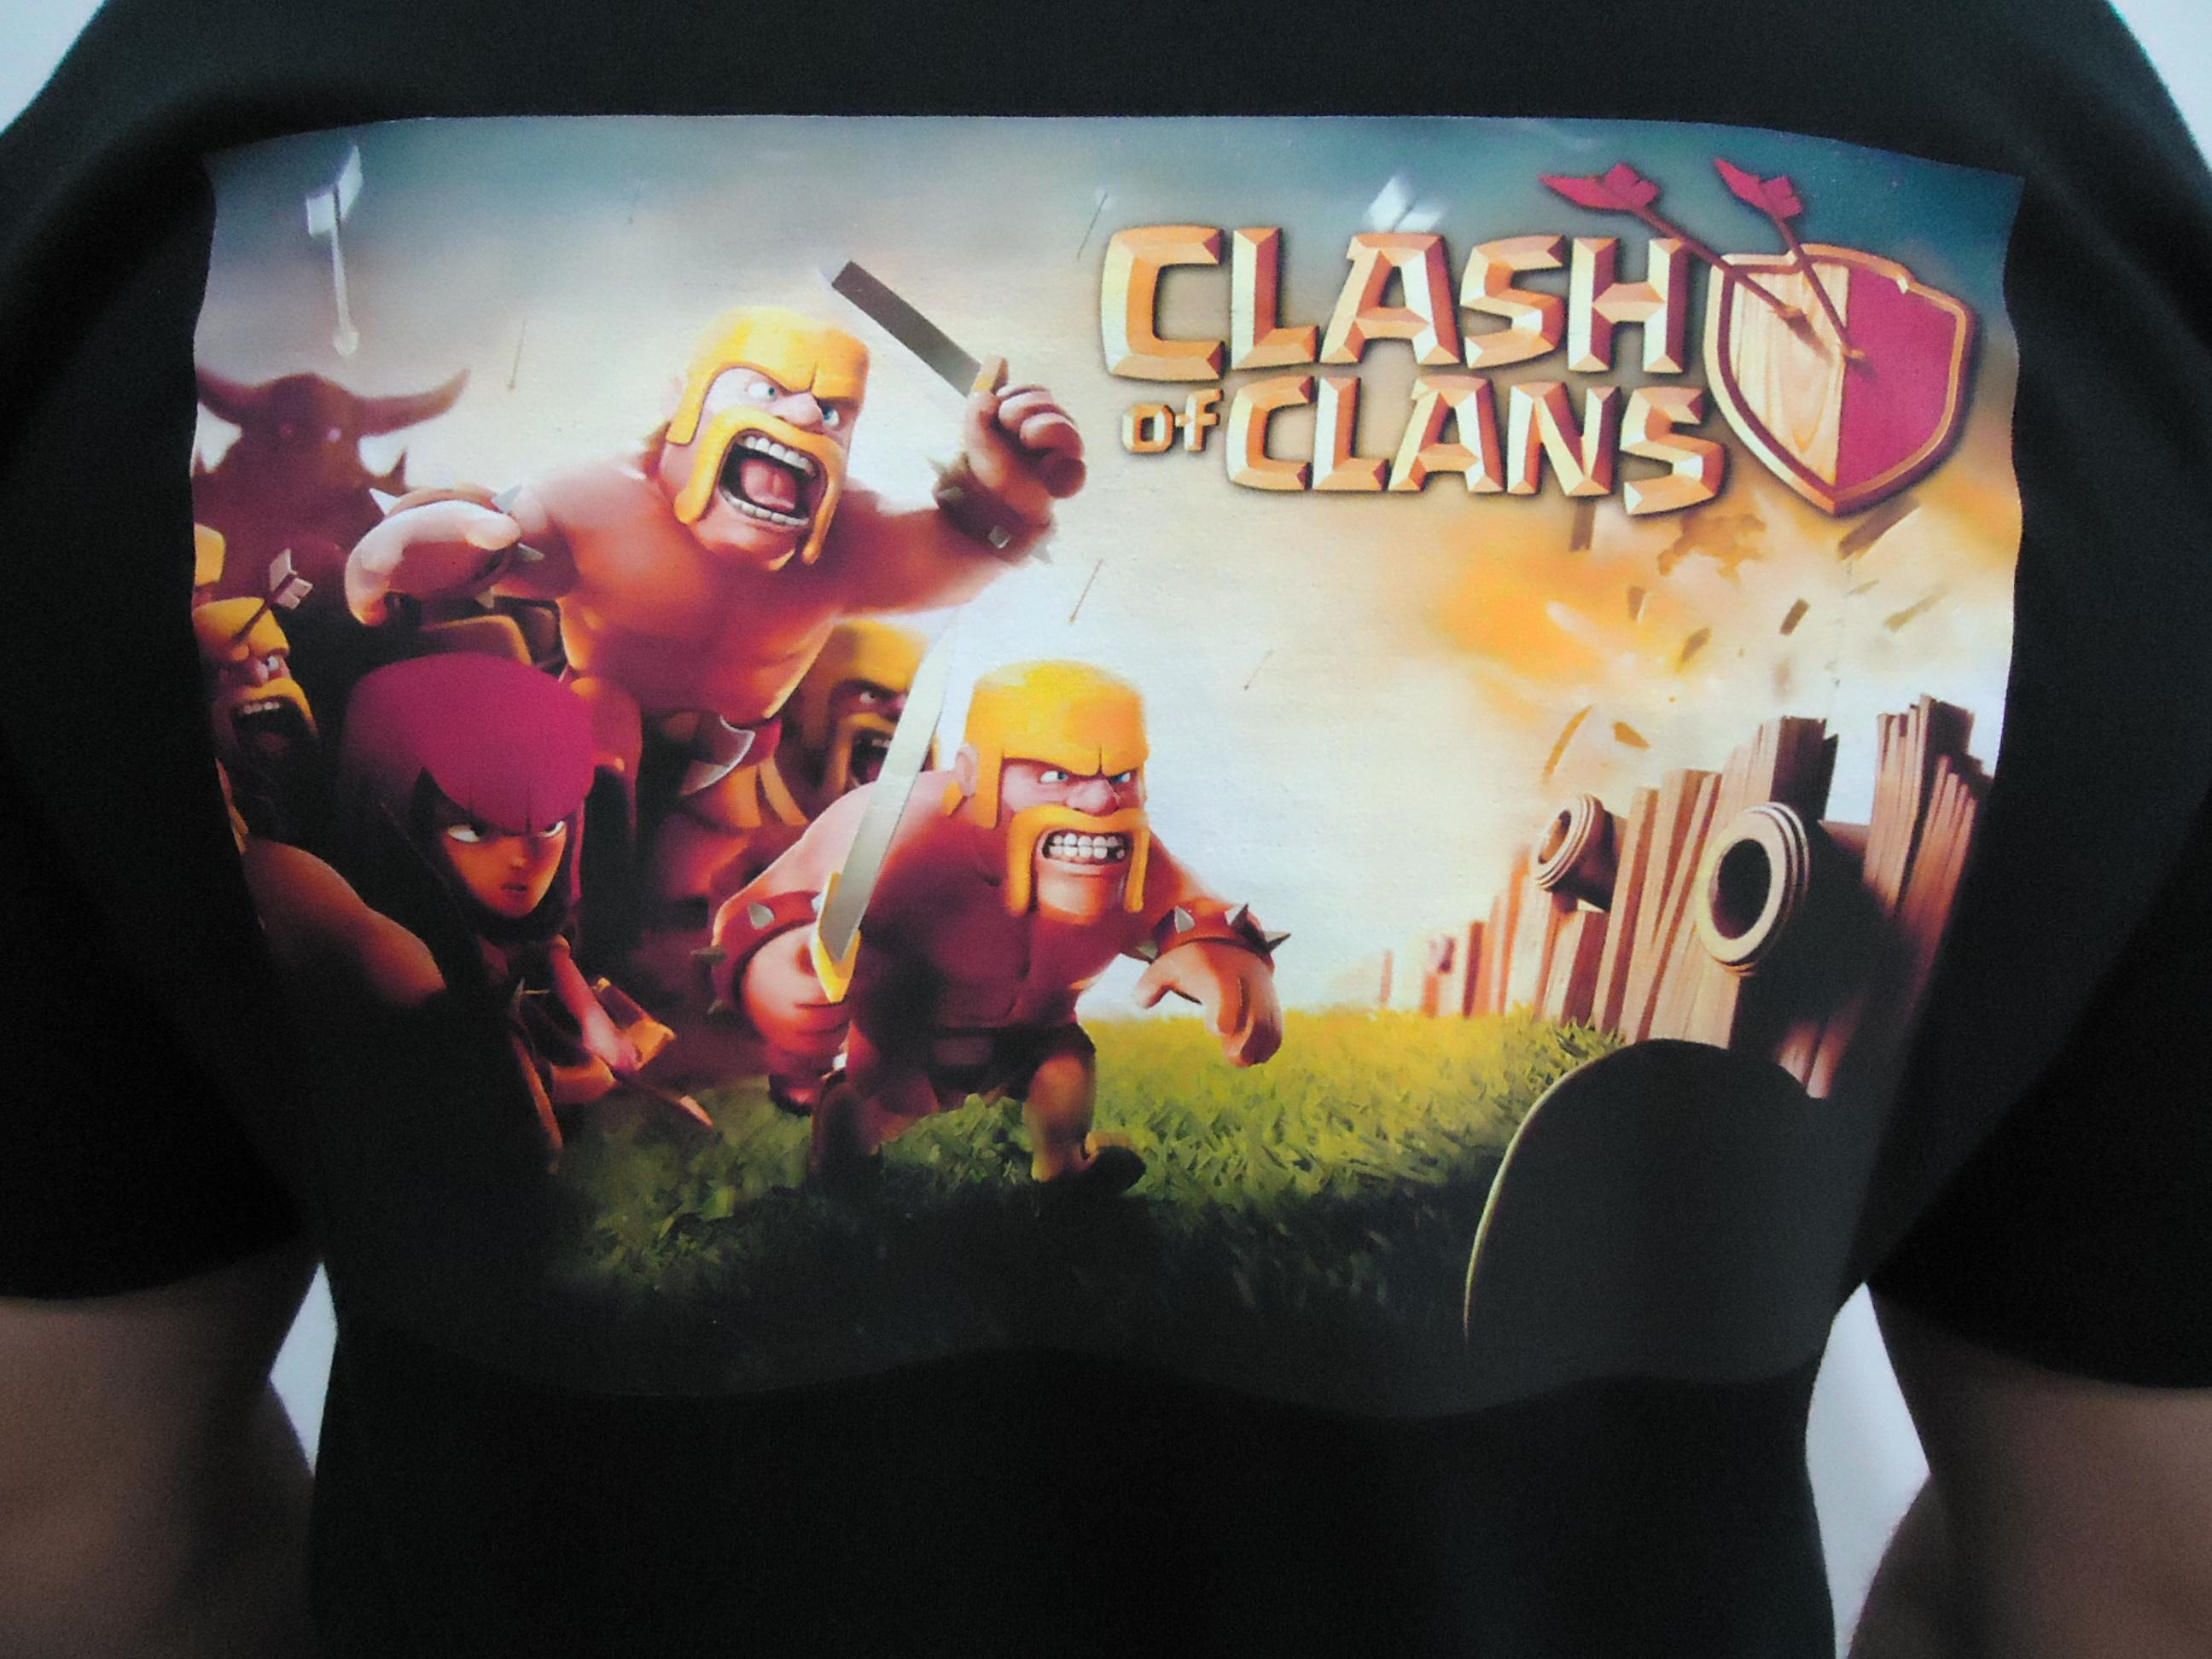 Clash of Clans Camiseta Clash of Clans Camiseta Clash of Clans